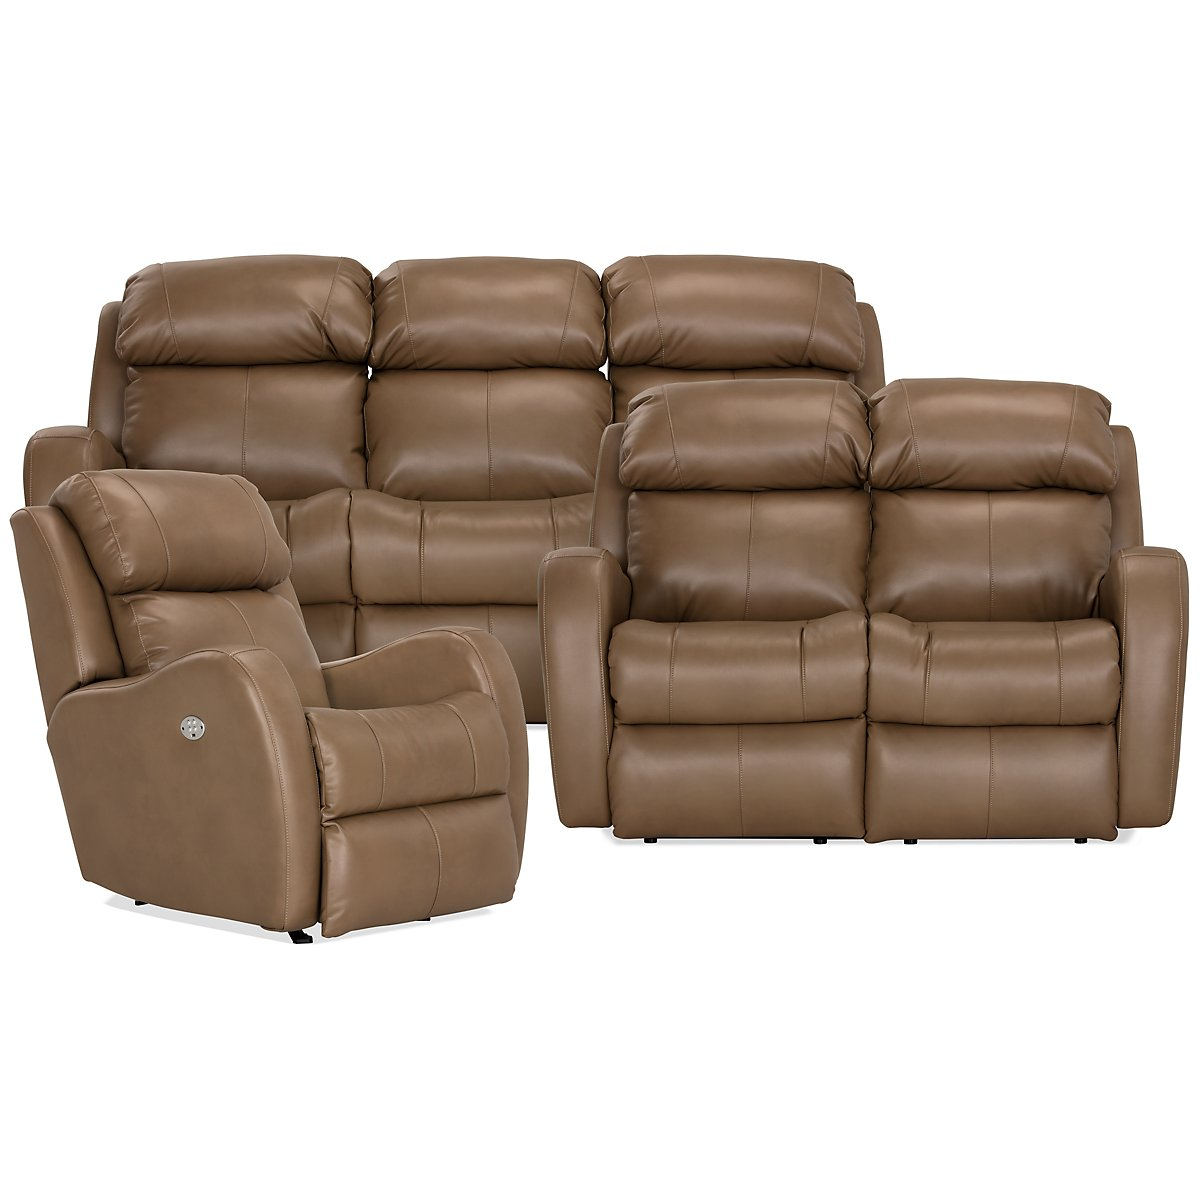 City Furniture Finn Brown Microfiber Power Reclining Sofa